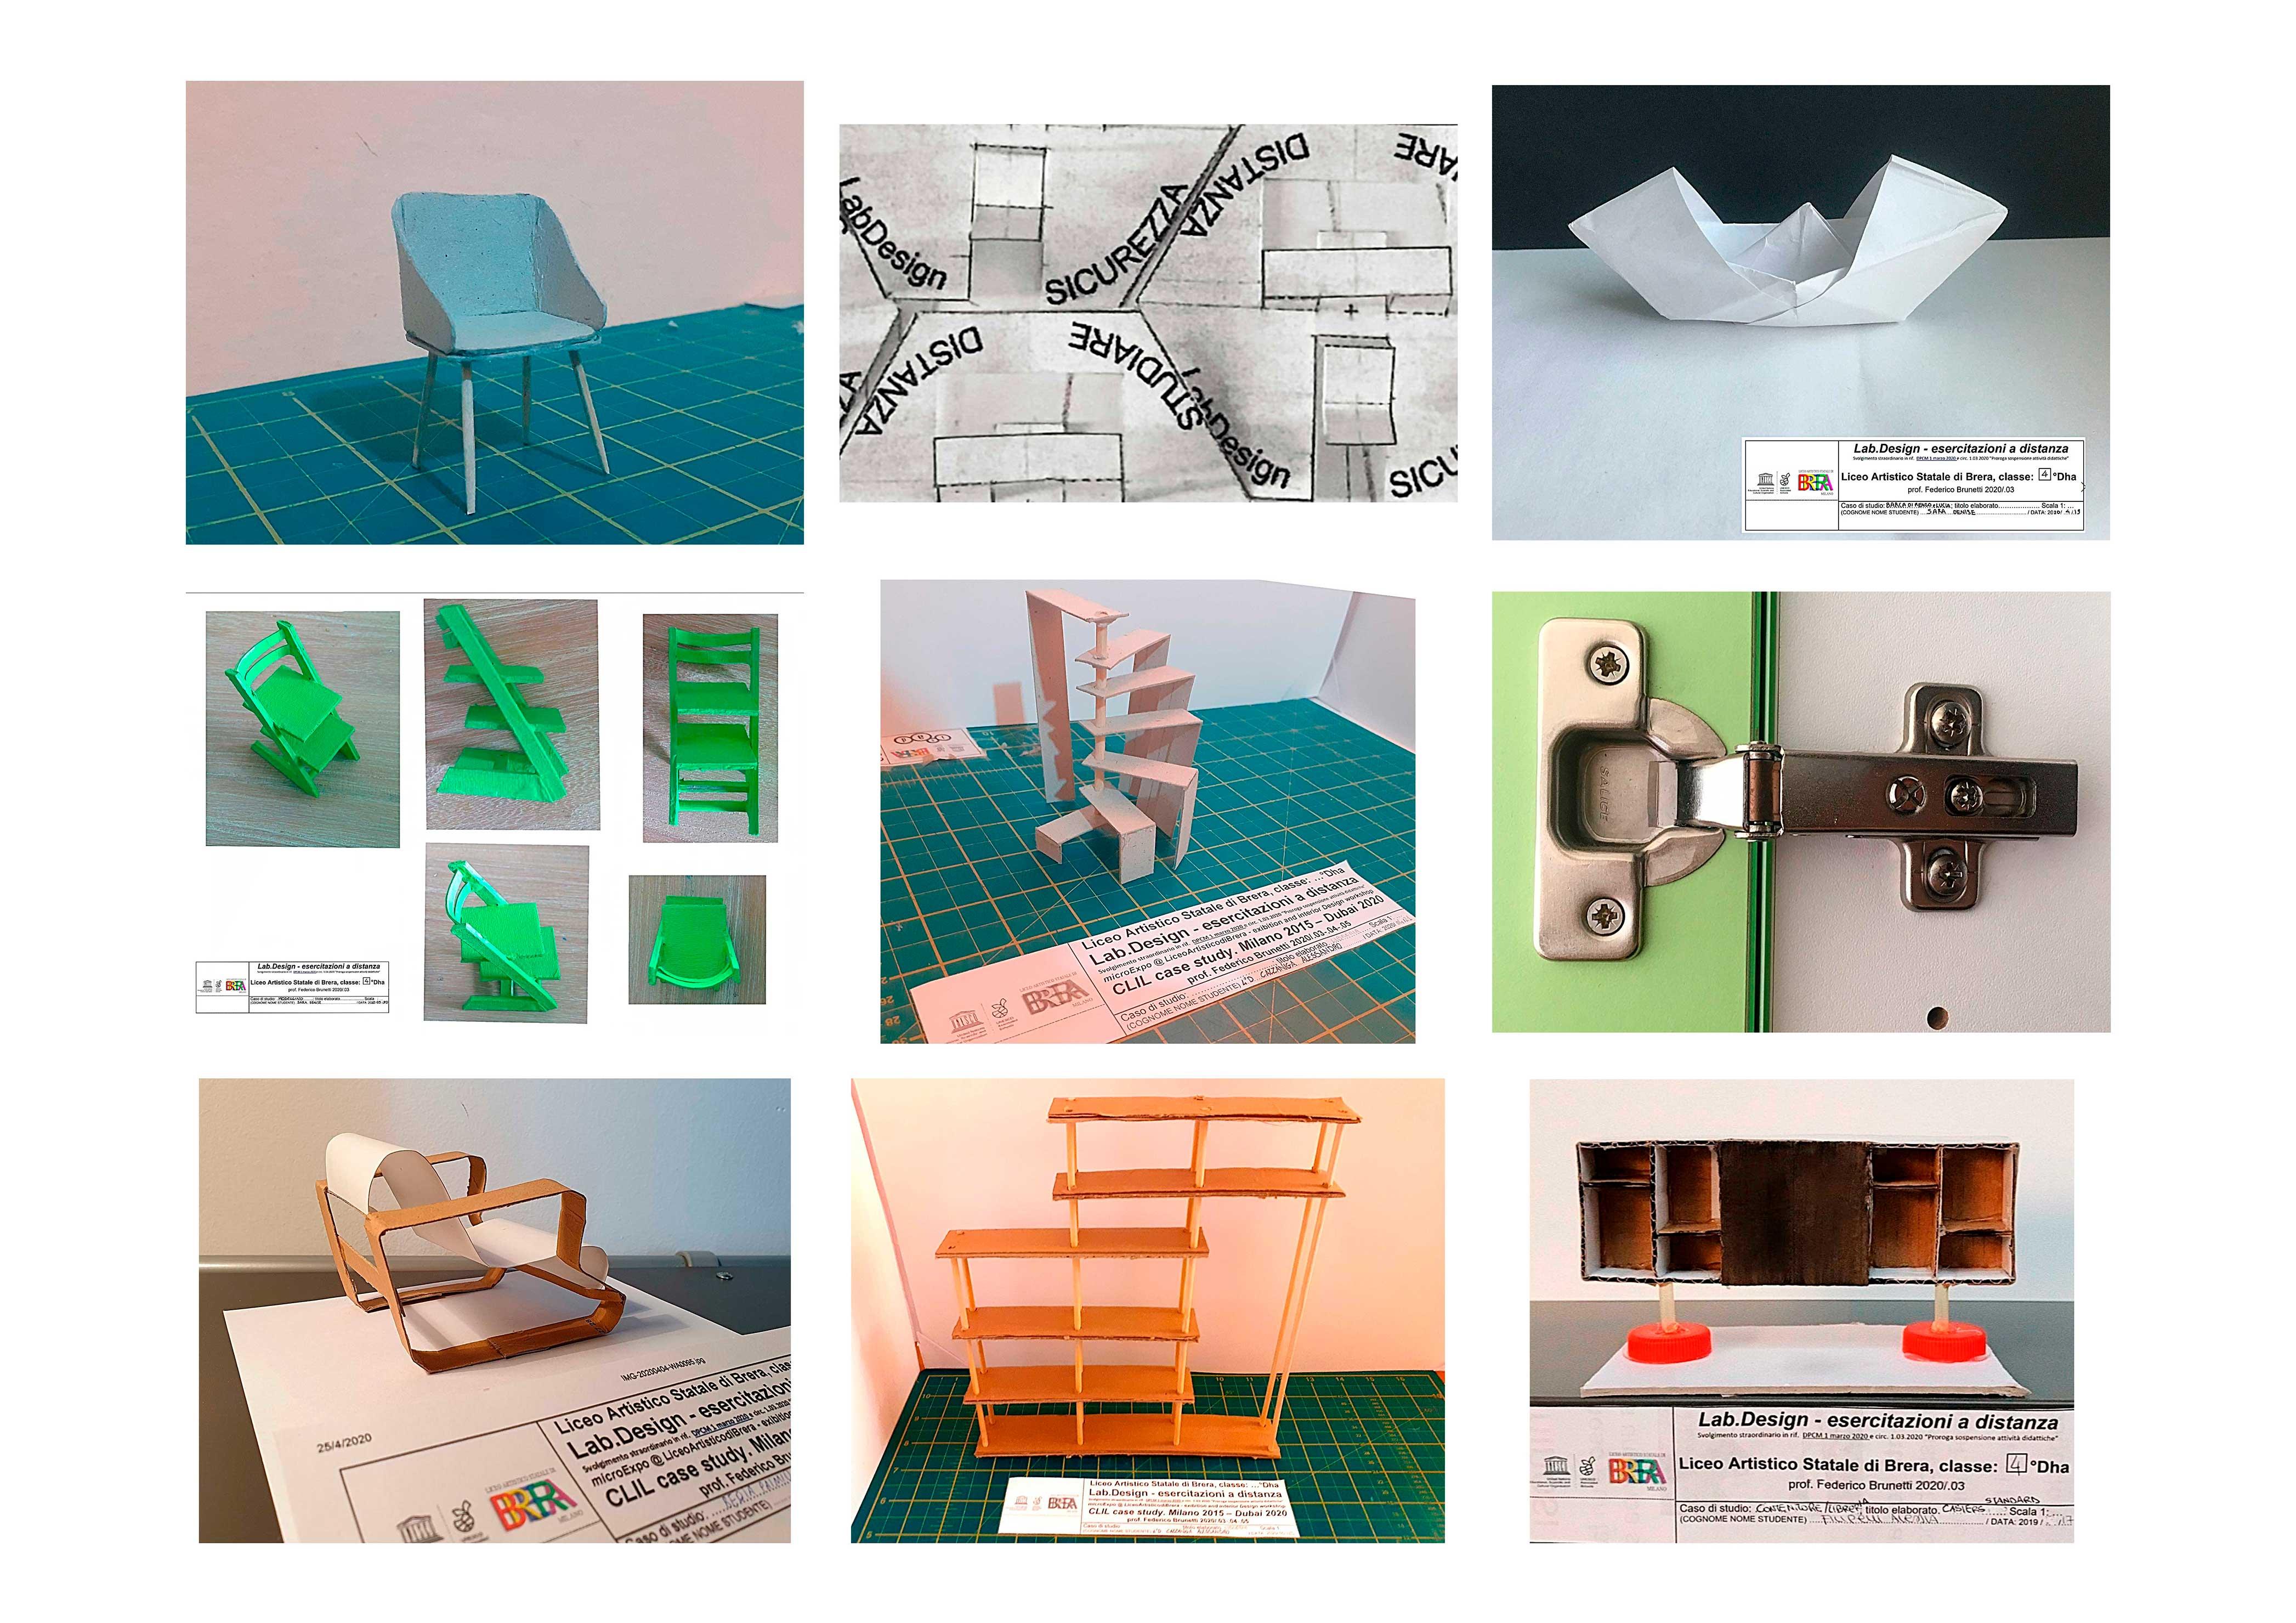 2_2020.06-LabDesign-DaD-prof.-F.-Brunetti-4Dha-5Dha-modelli-analogici_Page_2